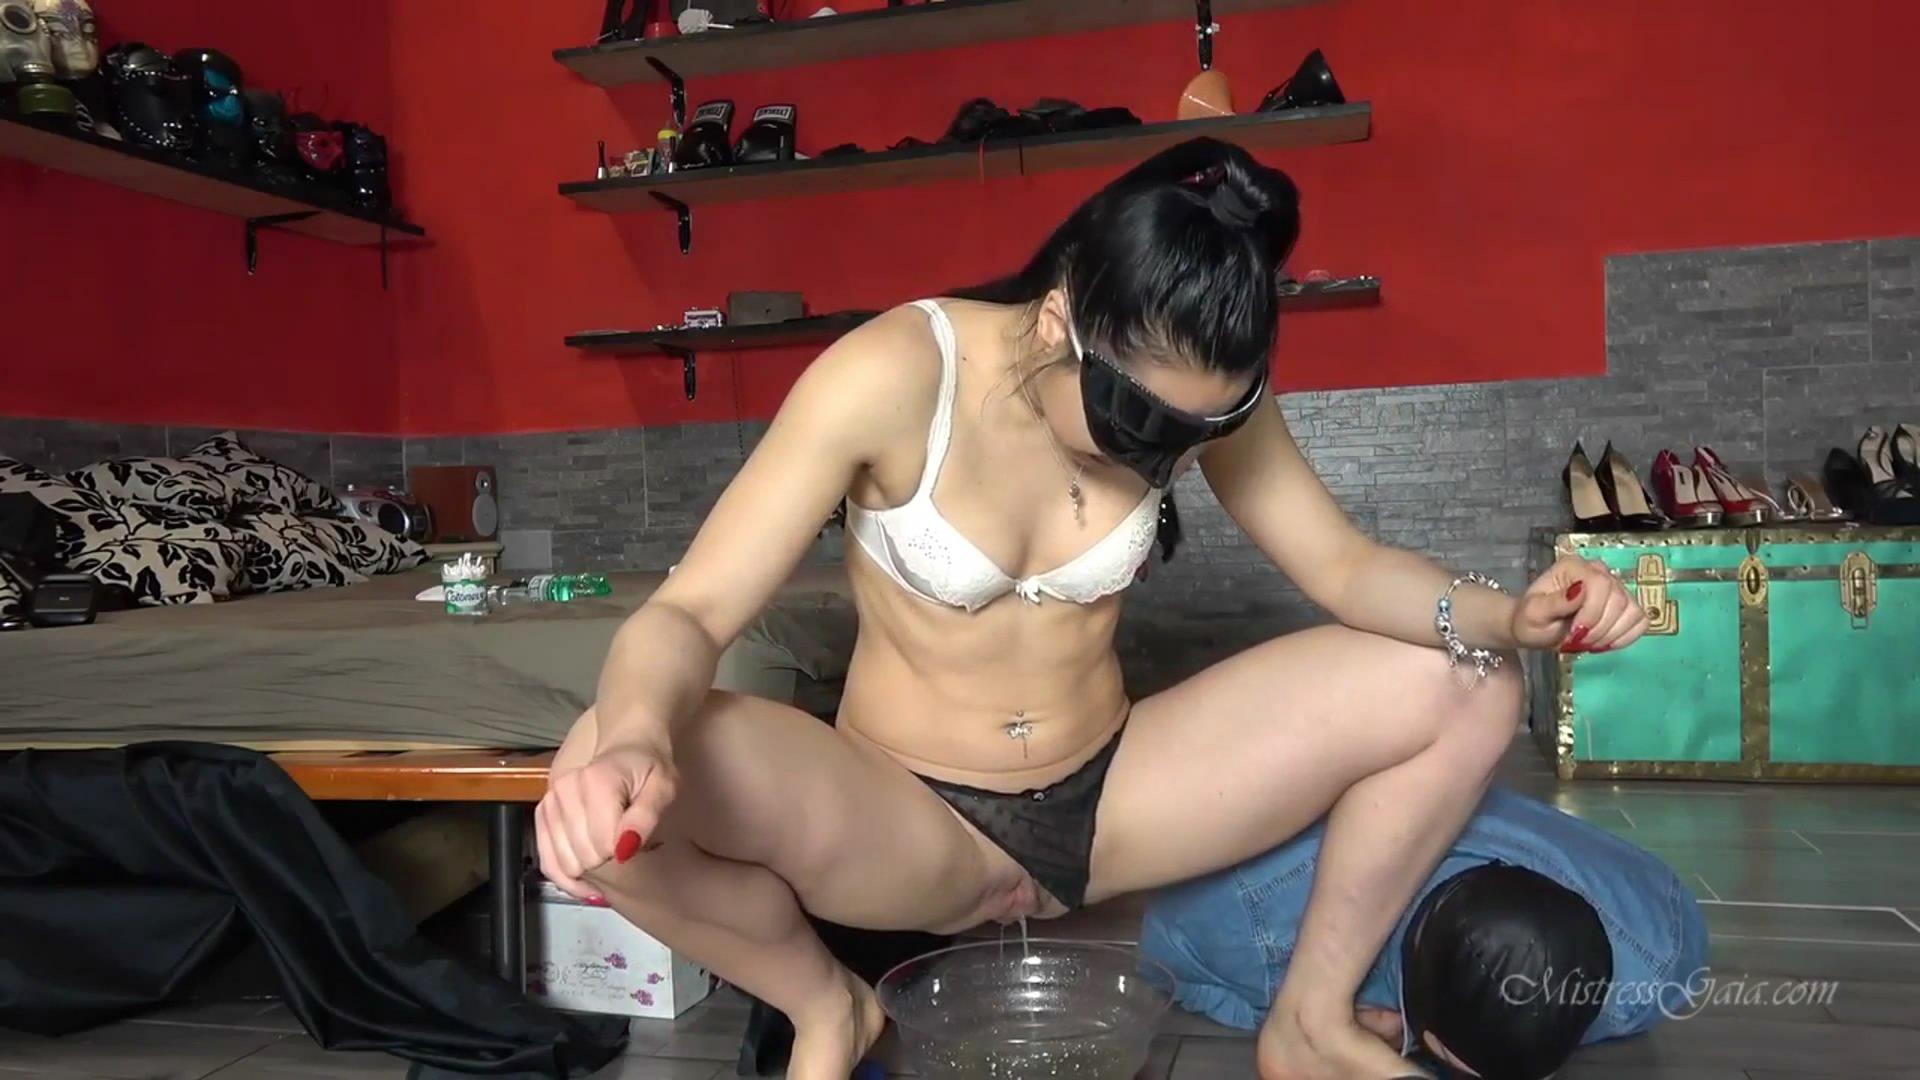 APPETIZING OBEDIENCE TEST starring in video Mistress Gaia (21,99€ mistress-gaia.com)